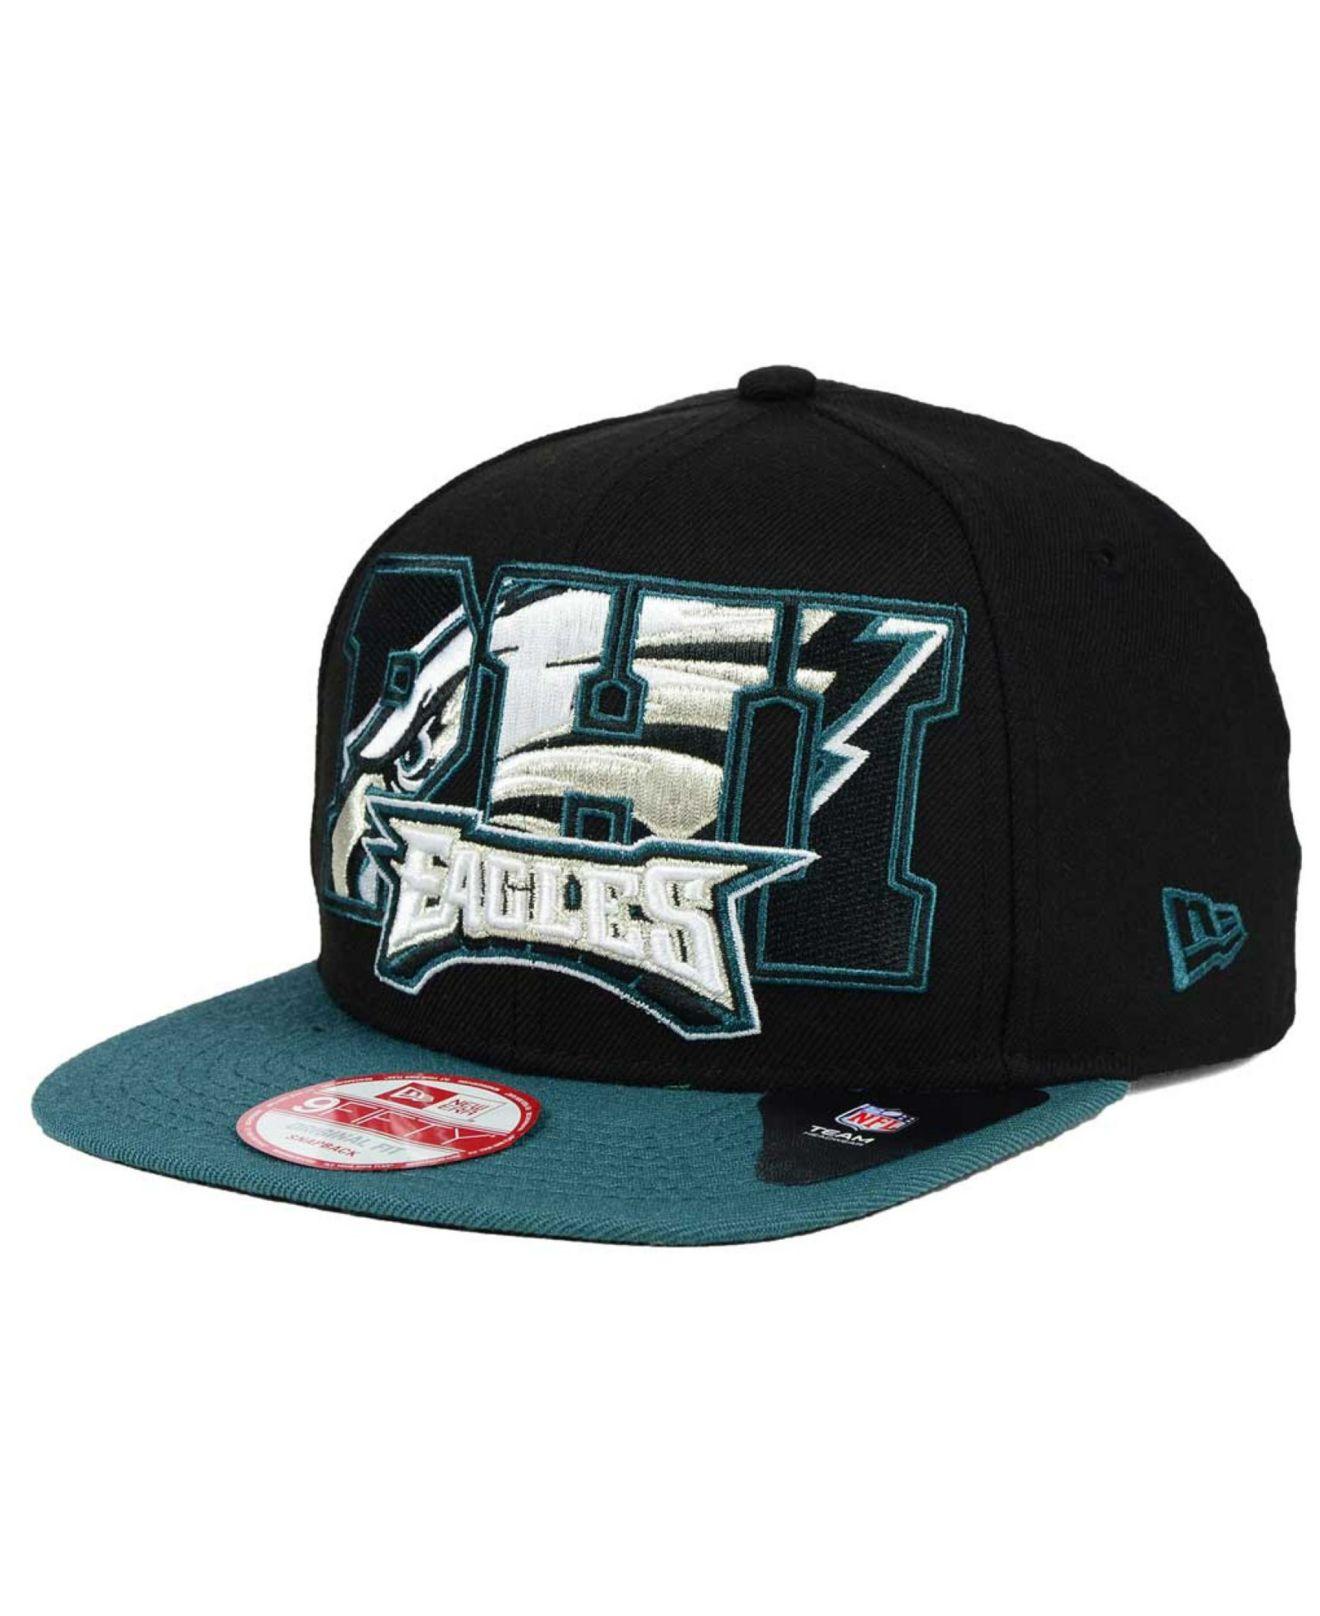 Lyst - Ktz Philadelphia Eagles Big City 9fifty Snapback Cap in Black ... 06acecfee592